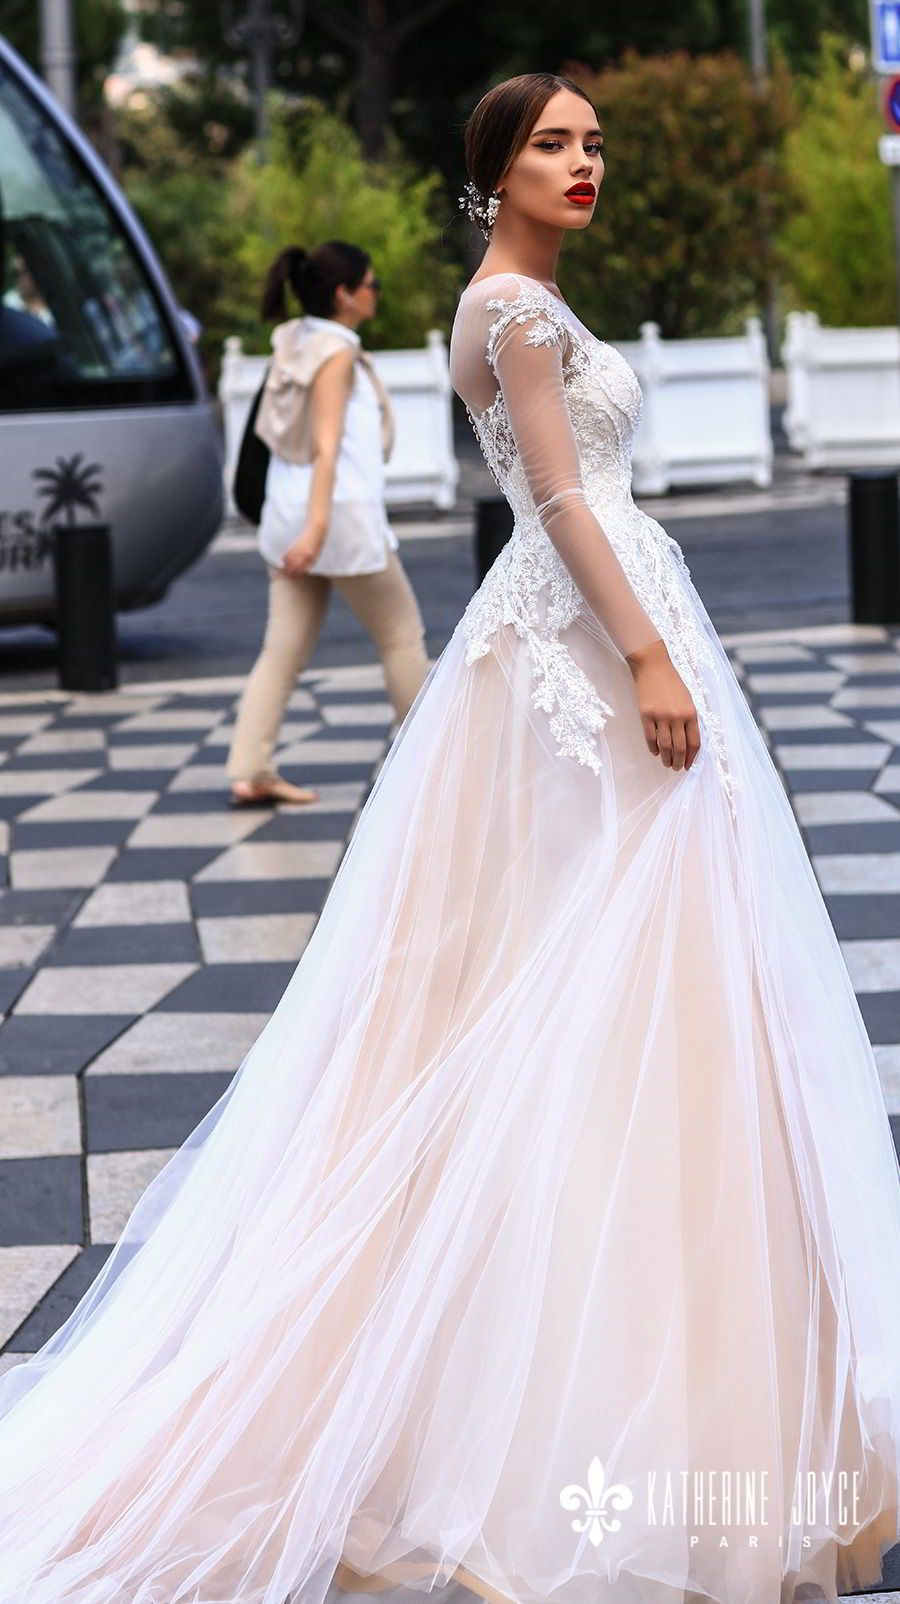 Katherine joyce wedding dresses u ucma cherieud bridal collection